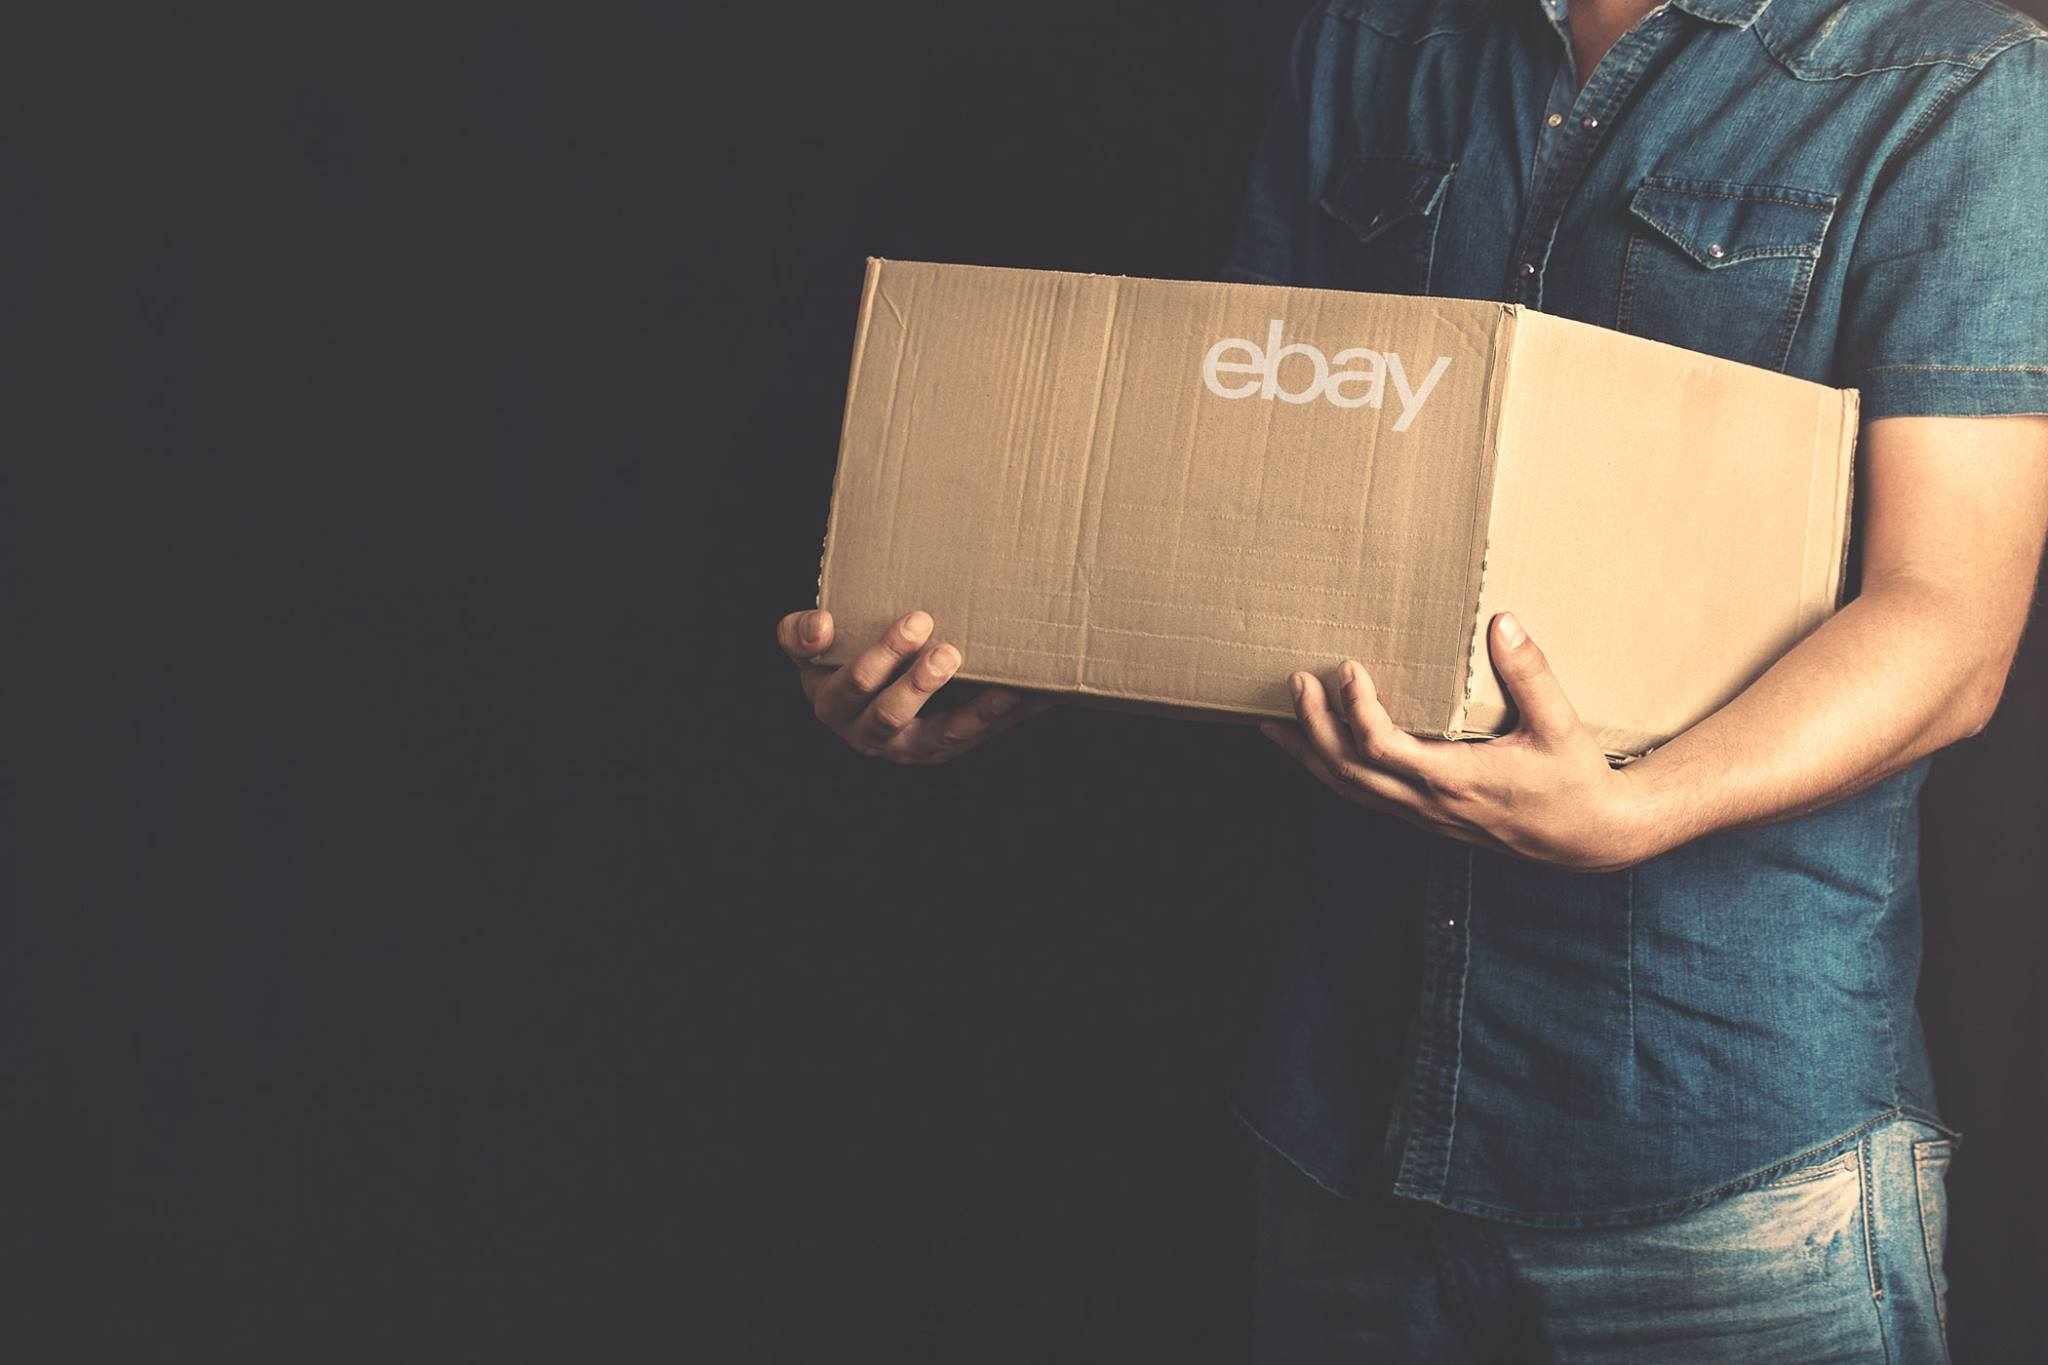 ebay-shutl-Paket eBay Fulfillment führt zu Kopfschütteln